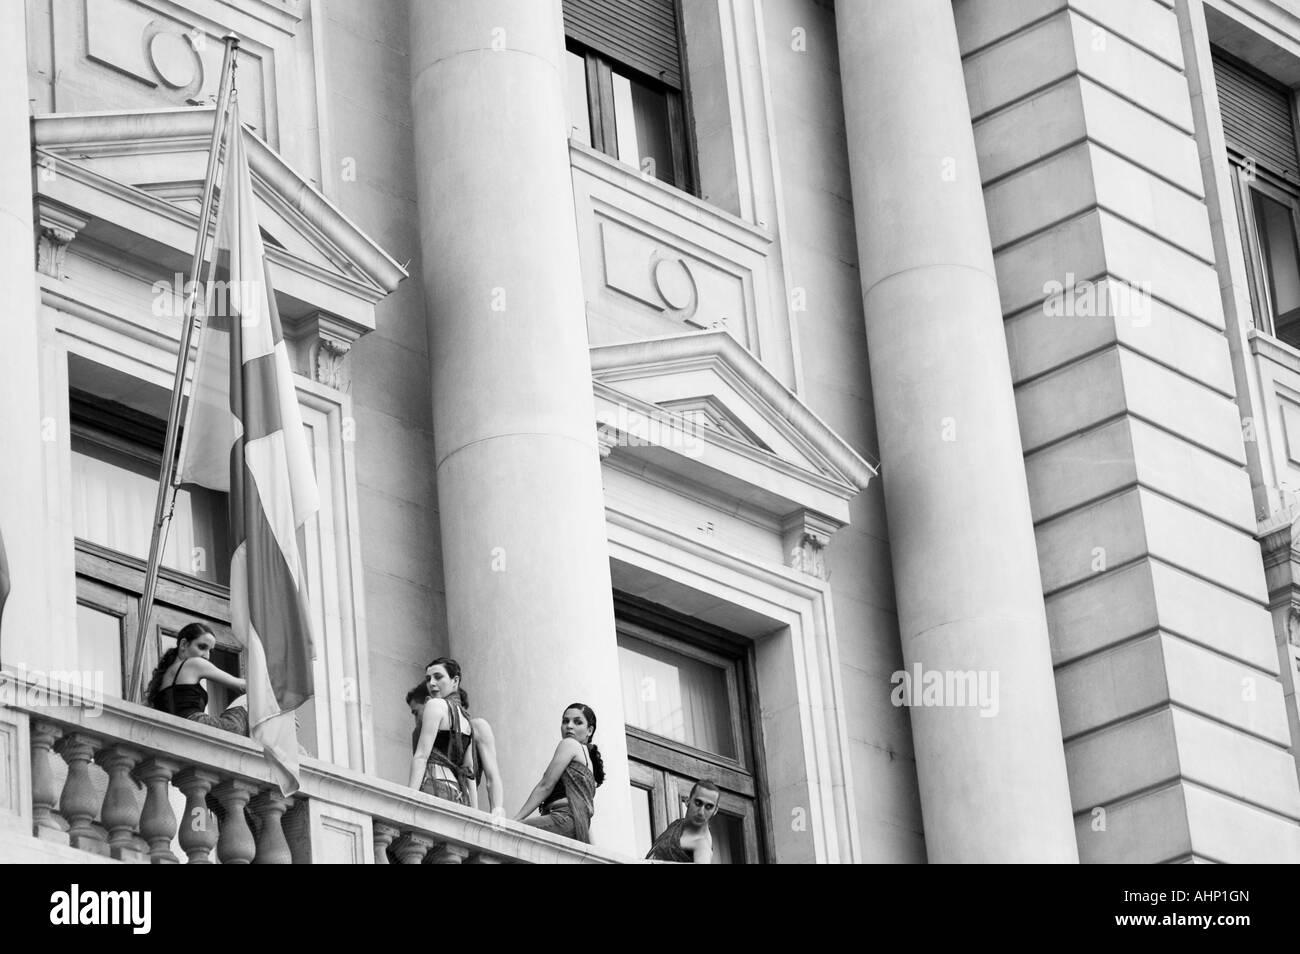 Dancers in a street contemporary dance & theater festival.  Spain Square, Zaragoza, Aragón, Spain. - Stock Image